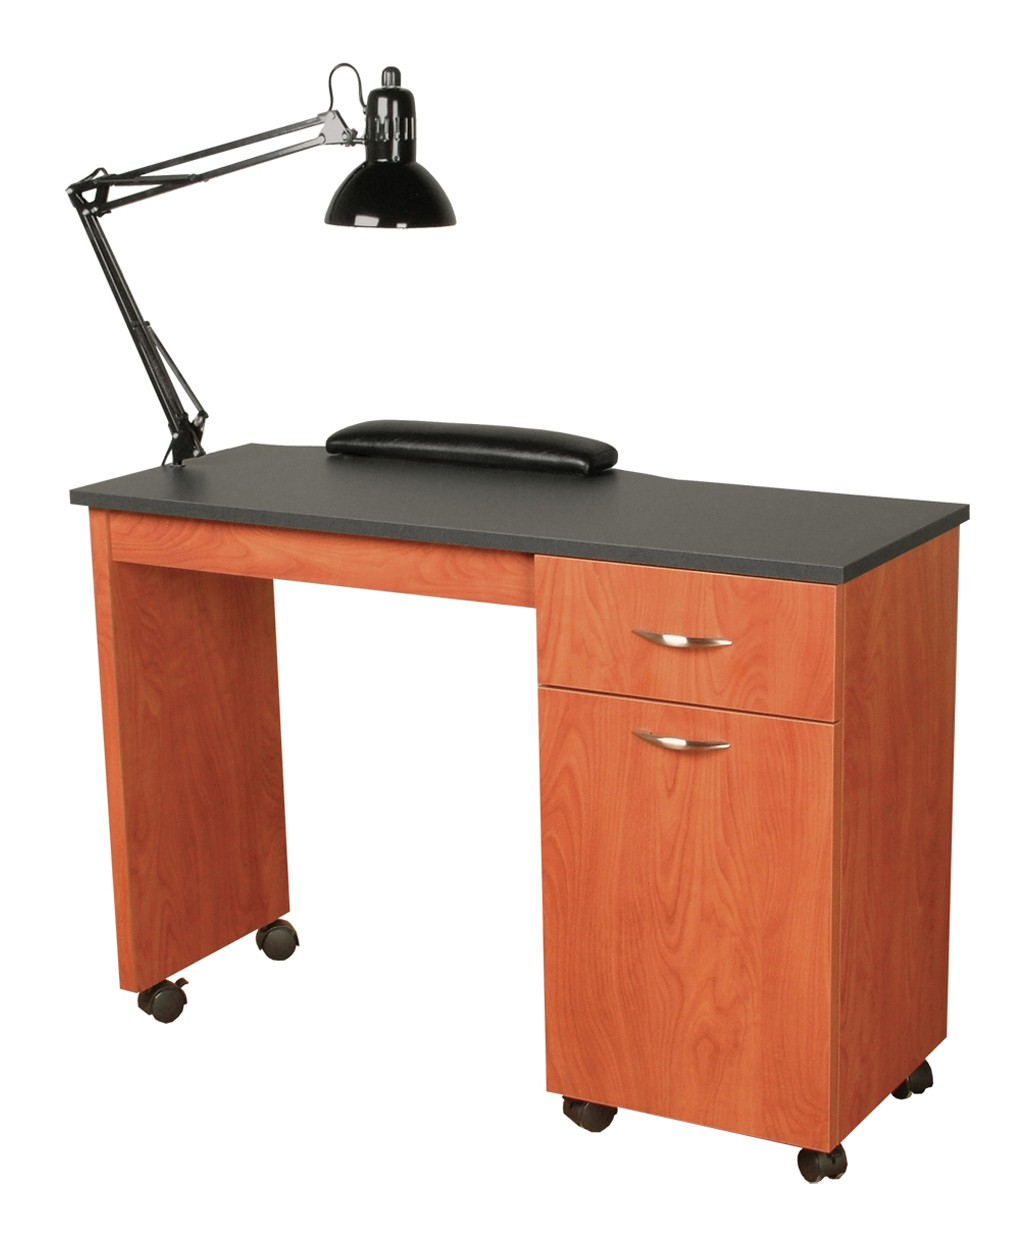 Collins QSE 3344-42 Cameo Manicure Table